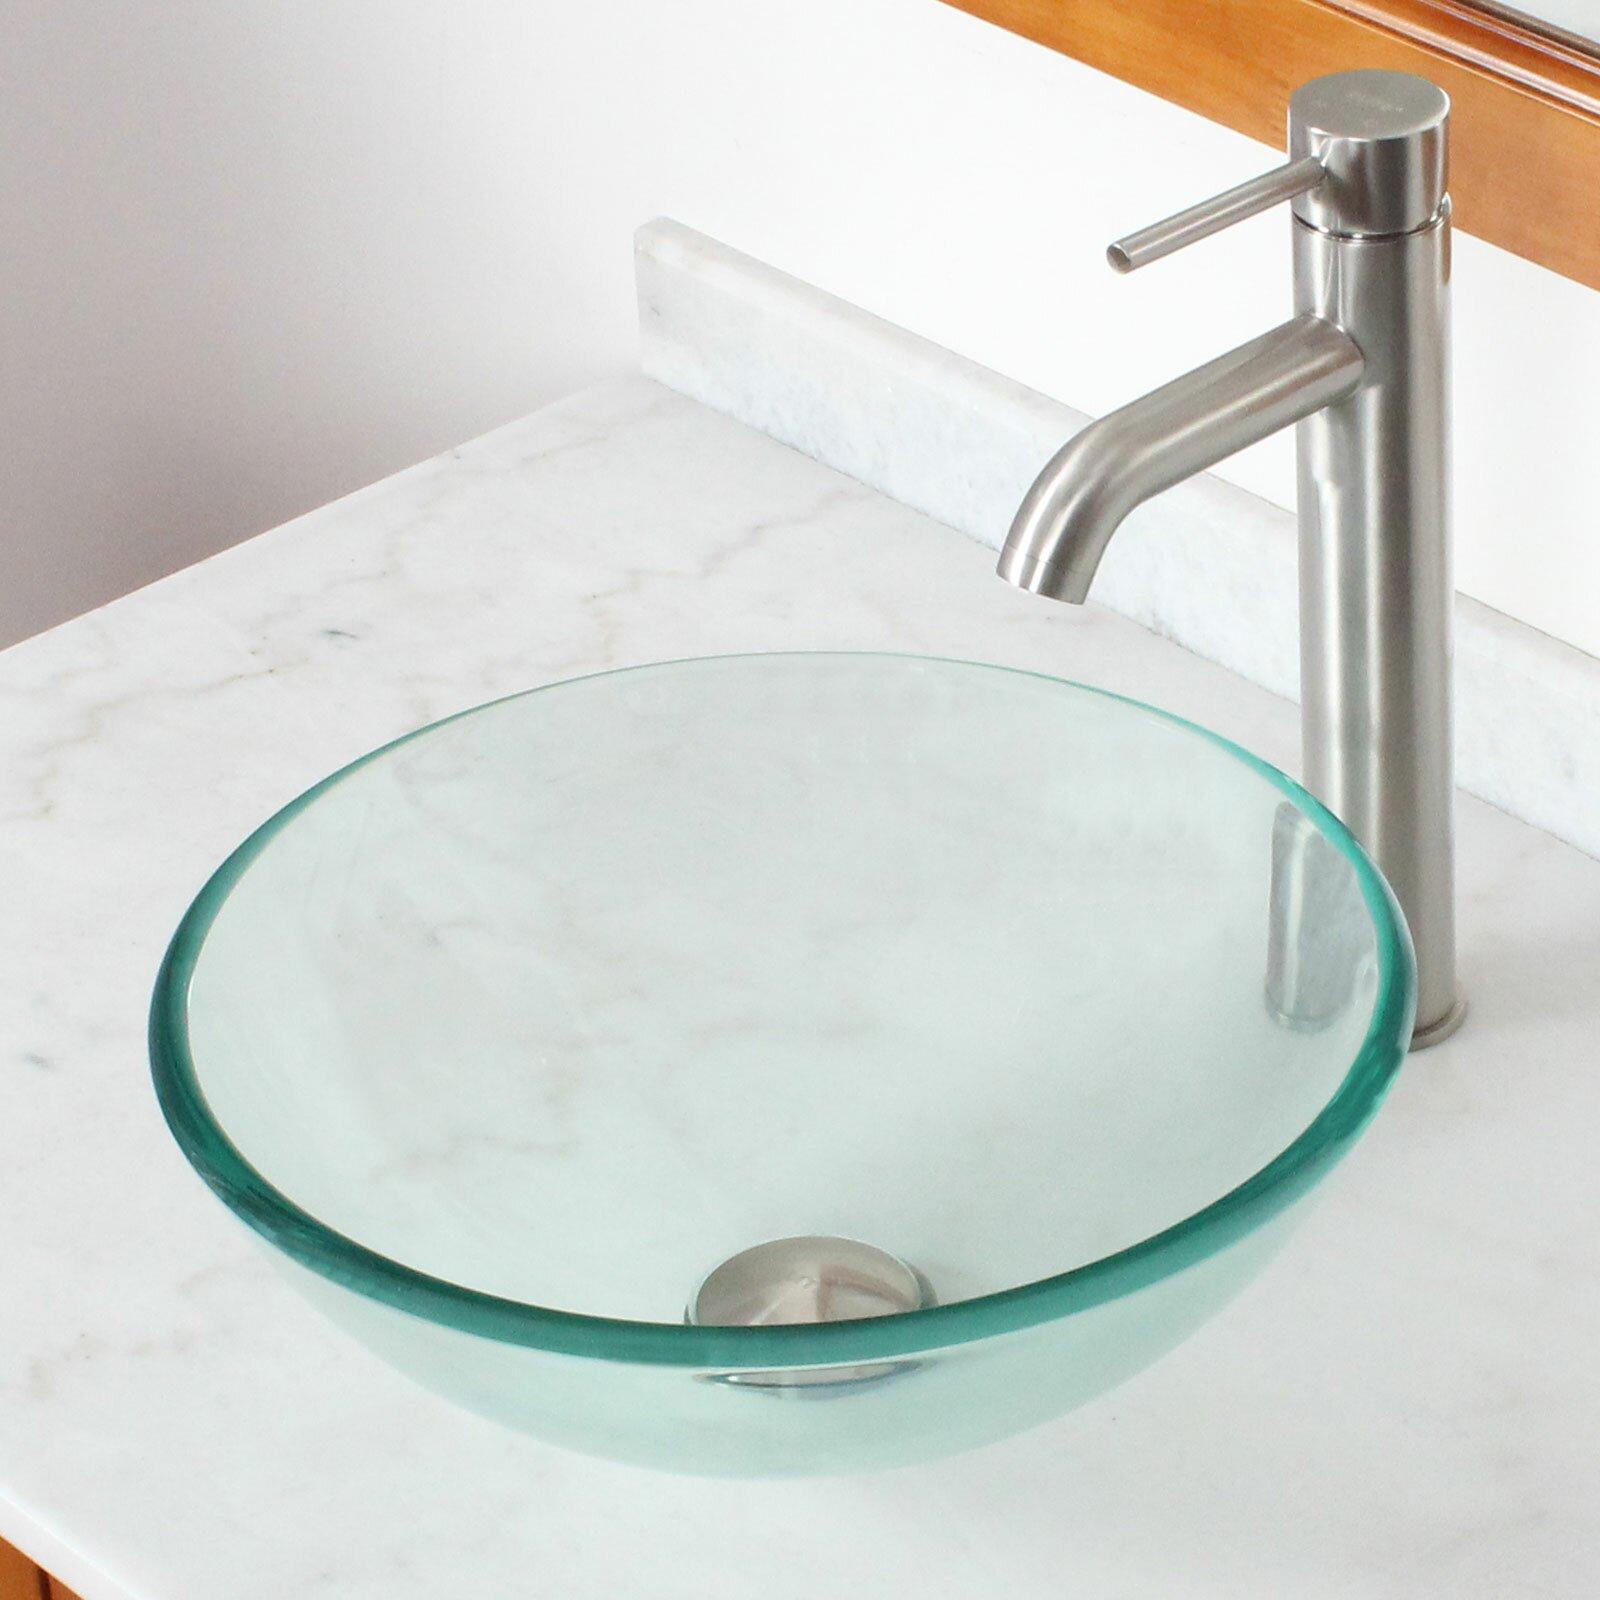 Elite tempered glass round bowl vessel bathroom sink wayfair - Bathroom tempered glass vessel sink ...